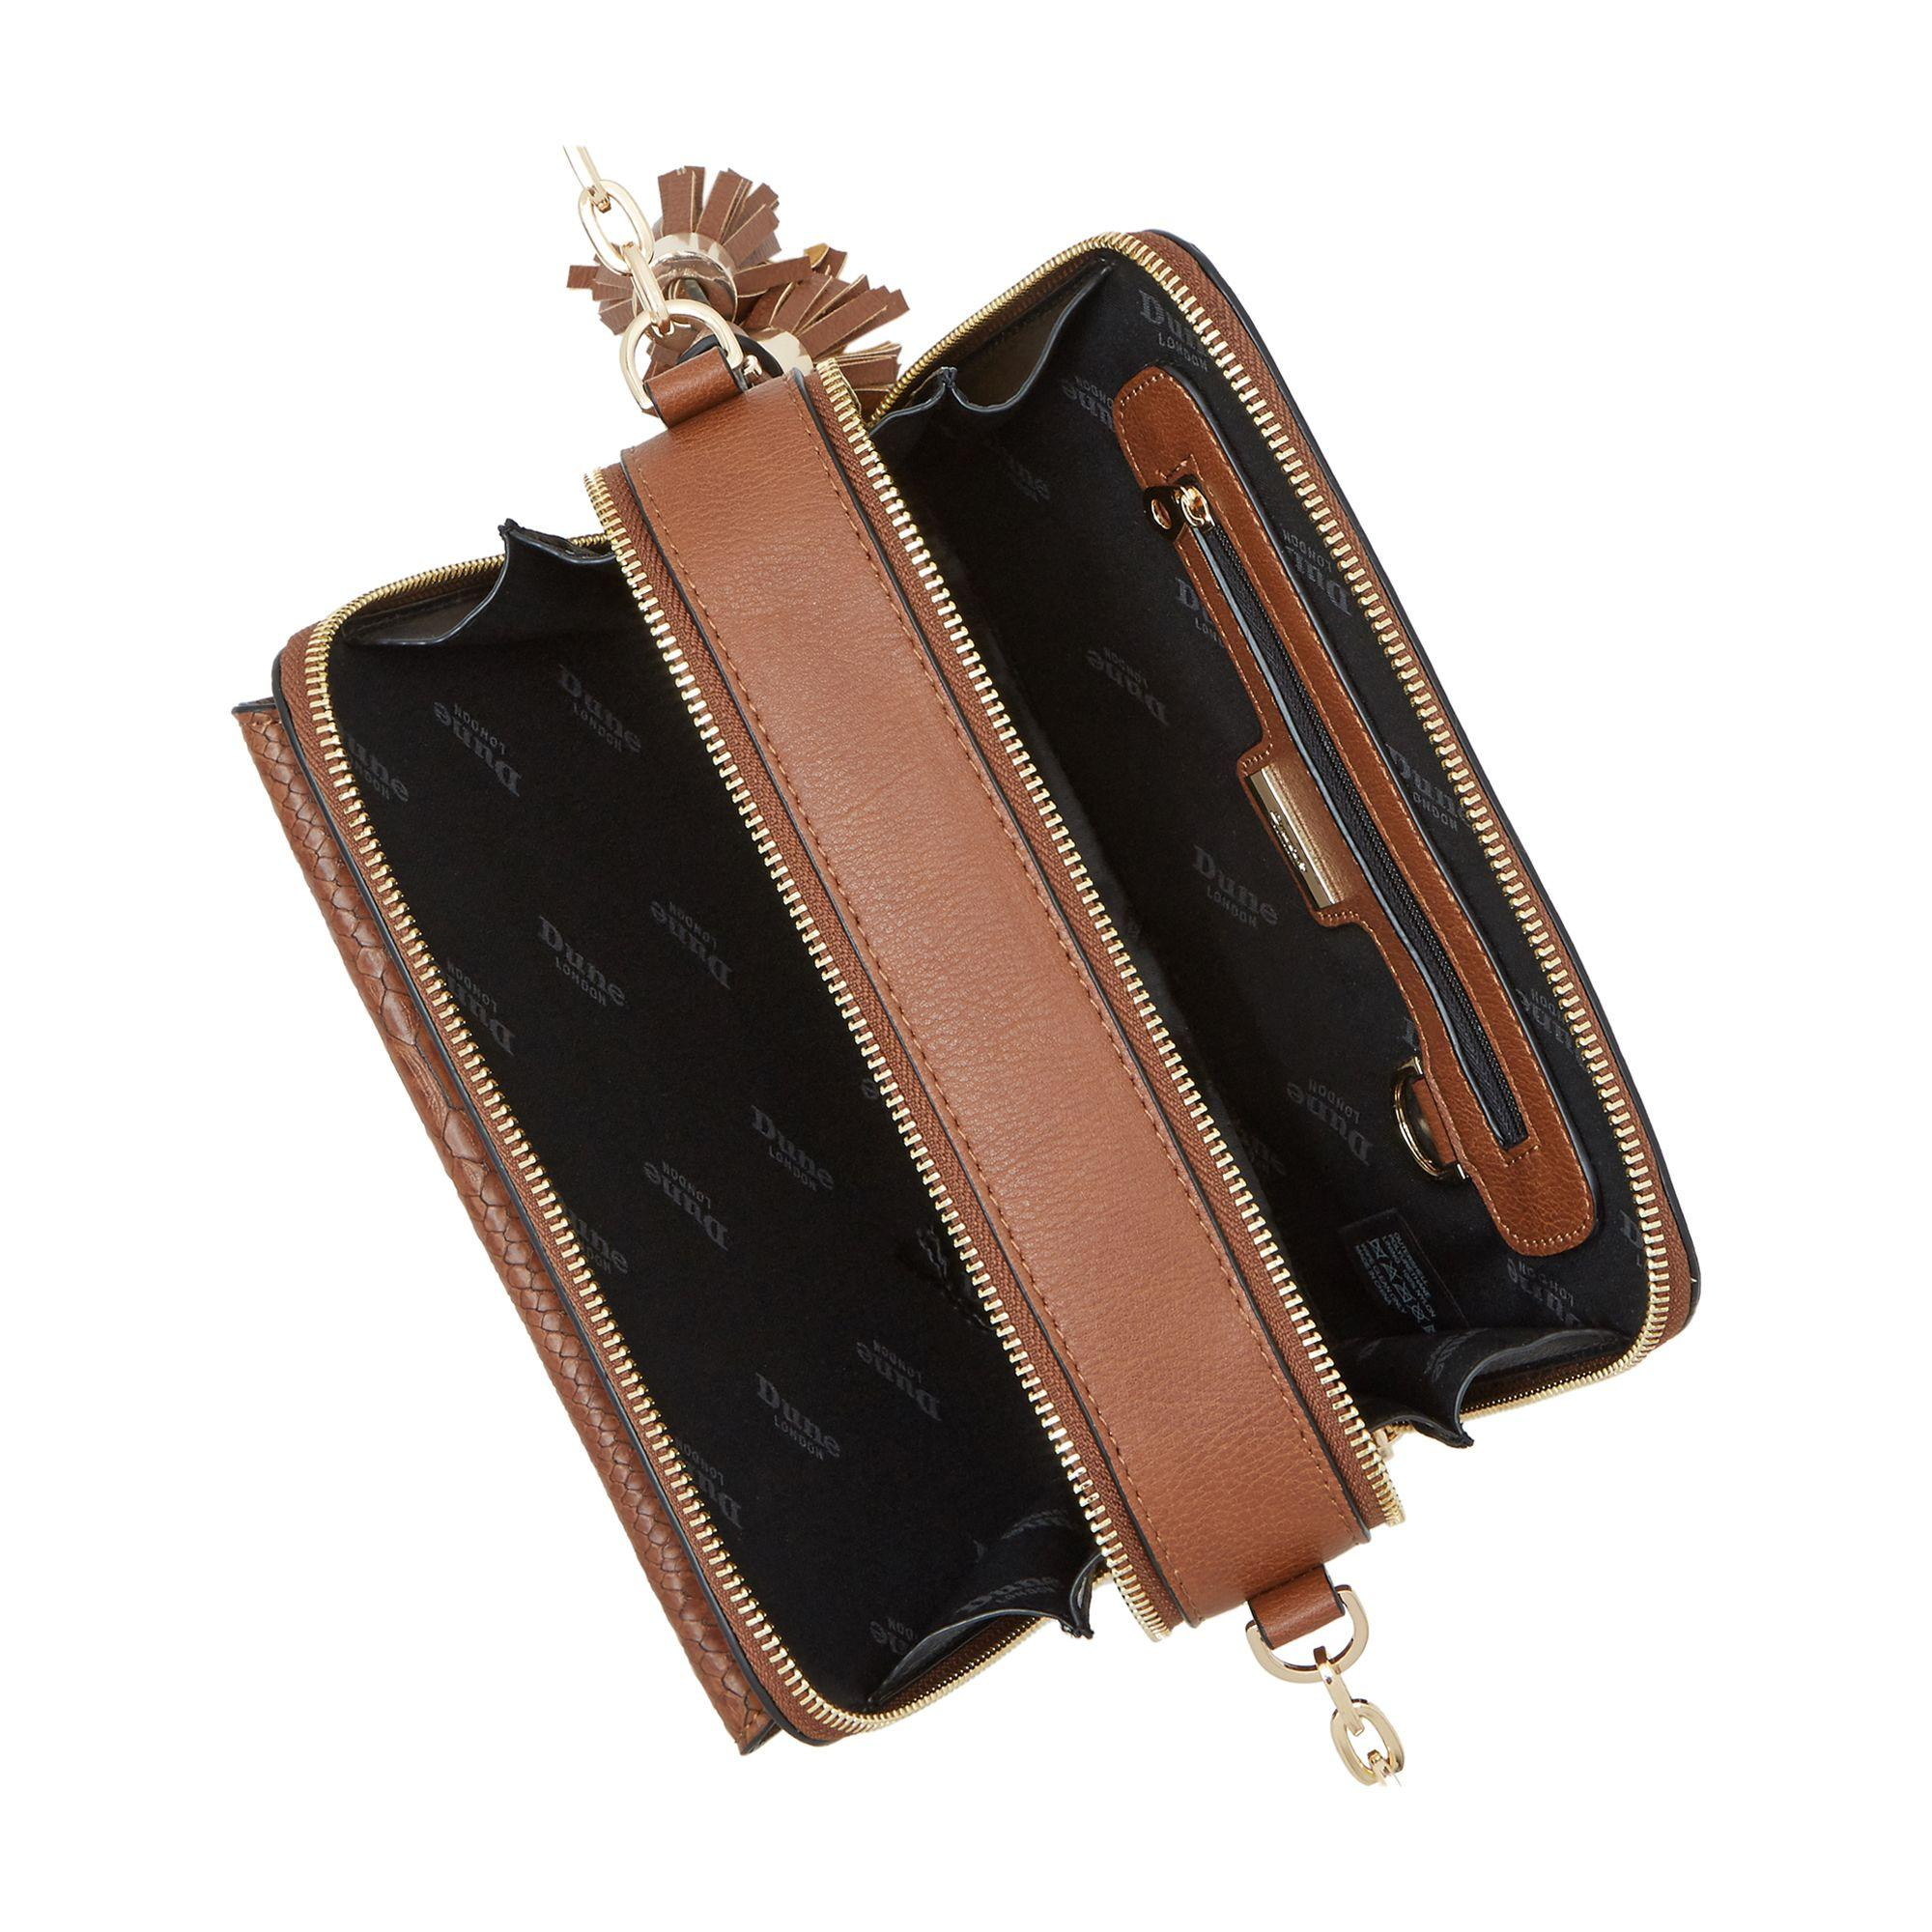 Dune Synthetic Dottie Chain Crossbody Envelope Bag in Tan (Brown)